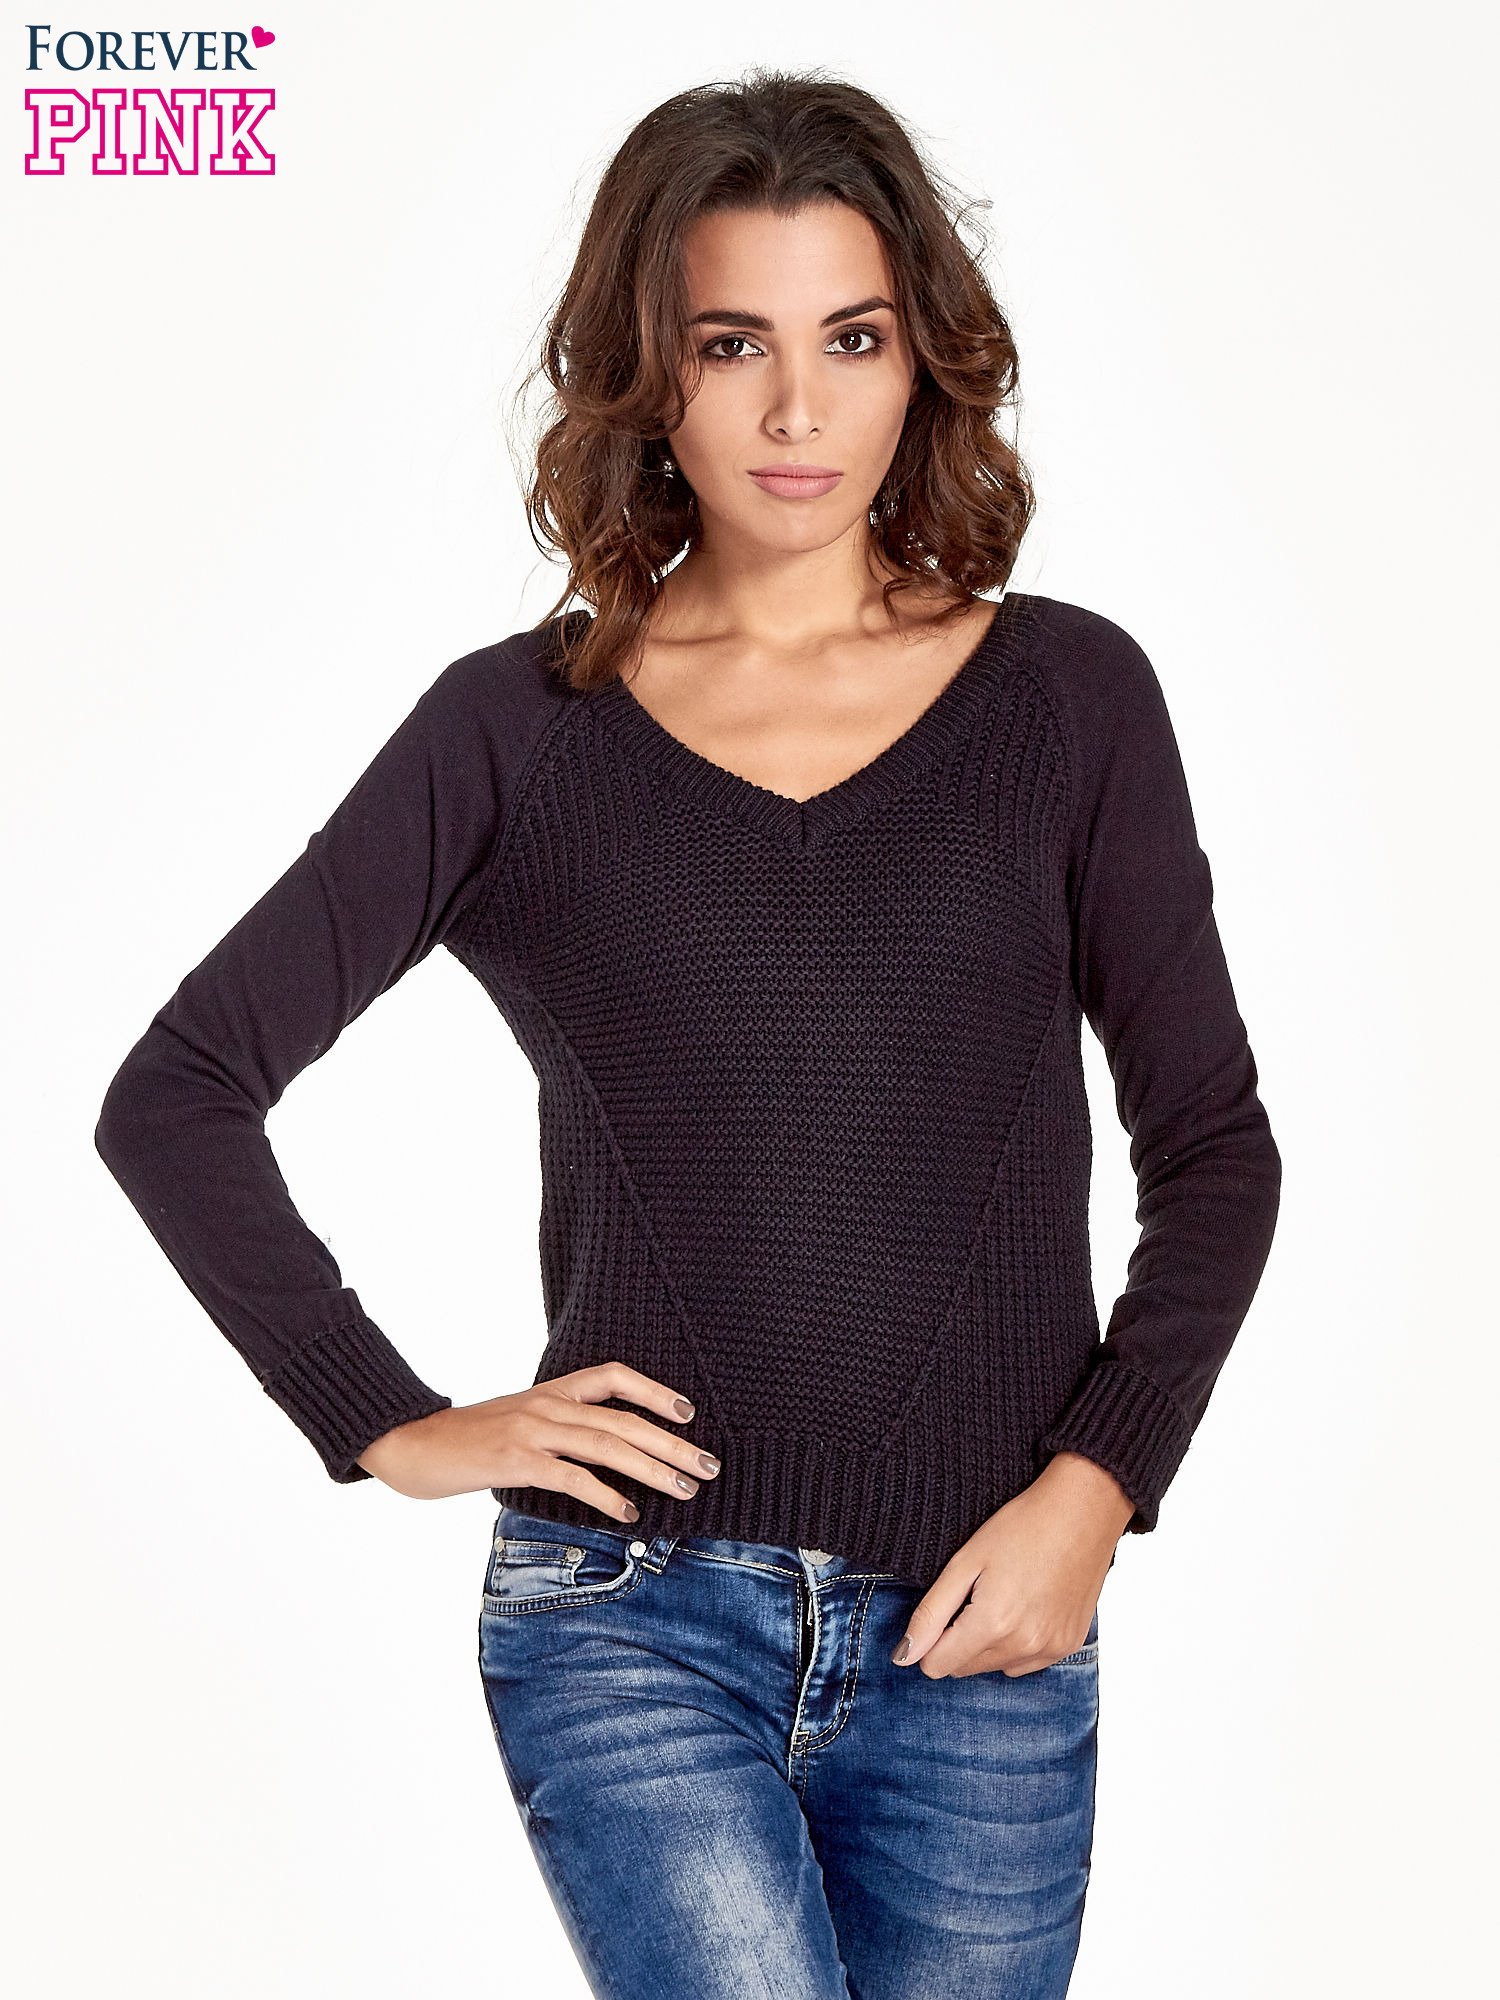 Granatowy sweter z dwustronnym dekoltem w serek                                  zdj.                                  1